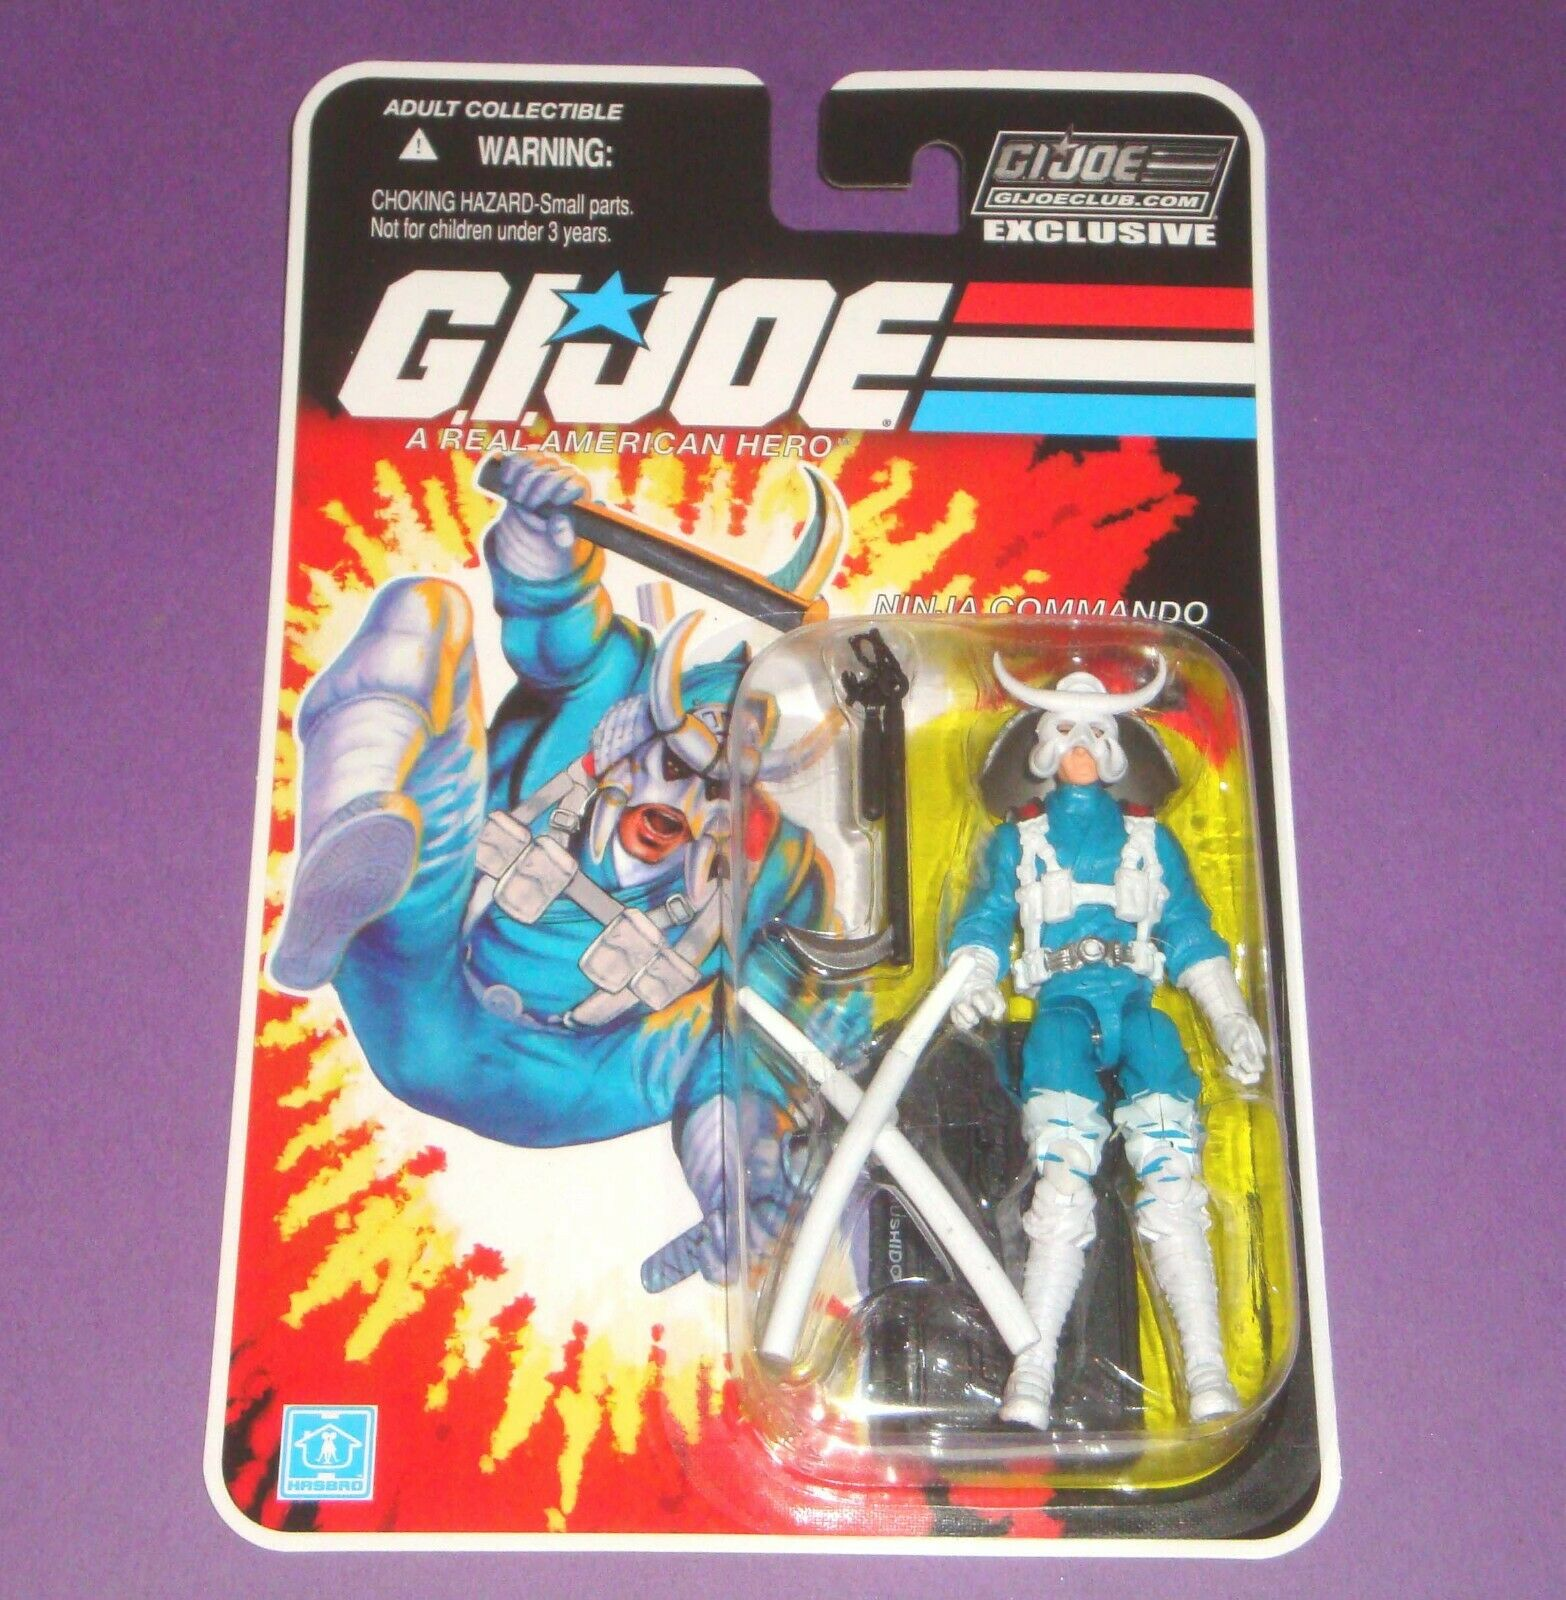 Bushido - FSS 8.0 - Sealed New MOC - GIJOE Figure